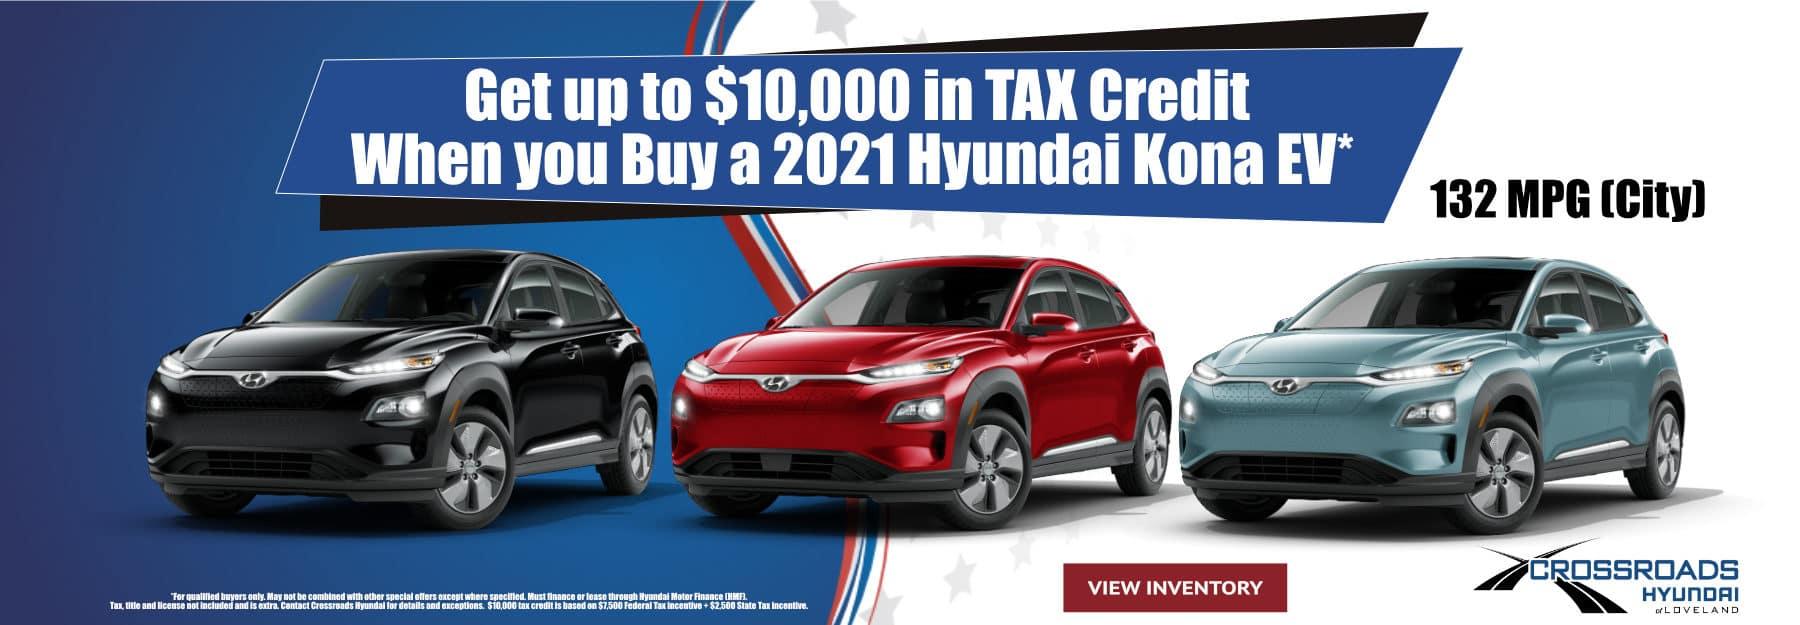 February_2021_Kona_EV_CROSSROADS_Hyundai